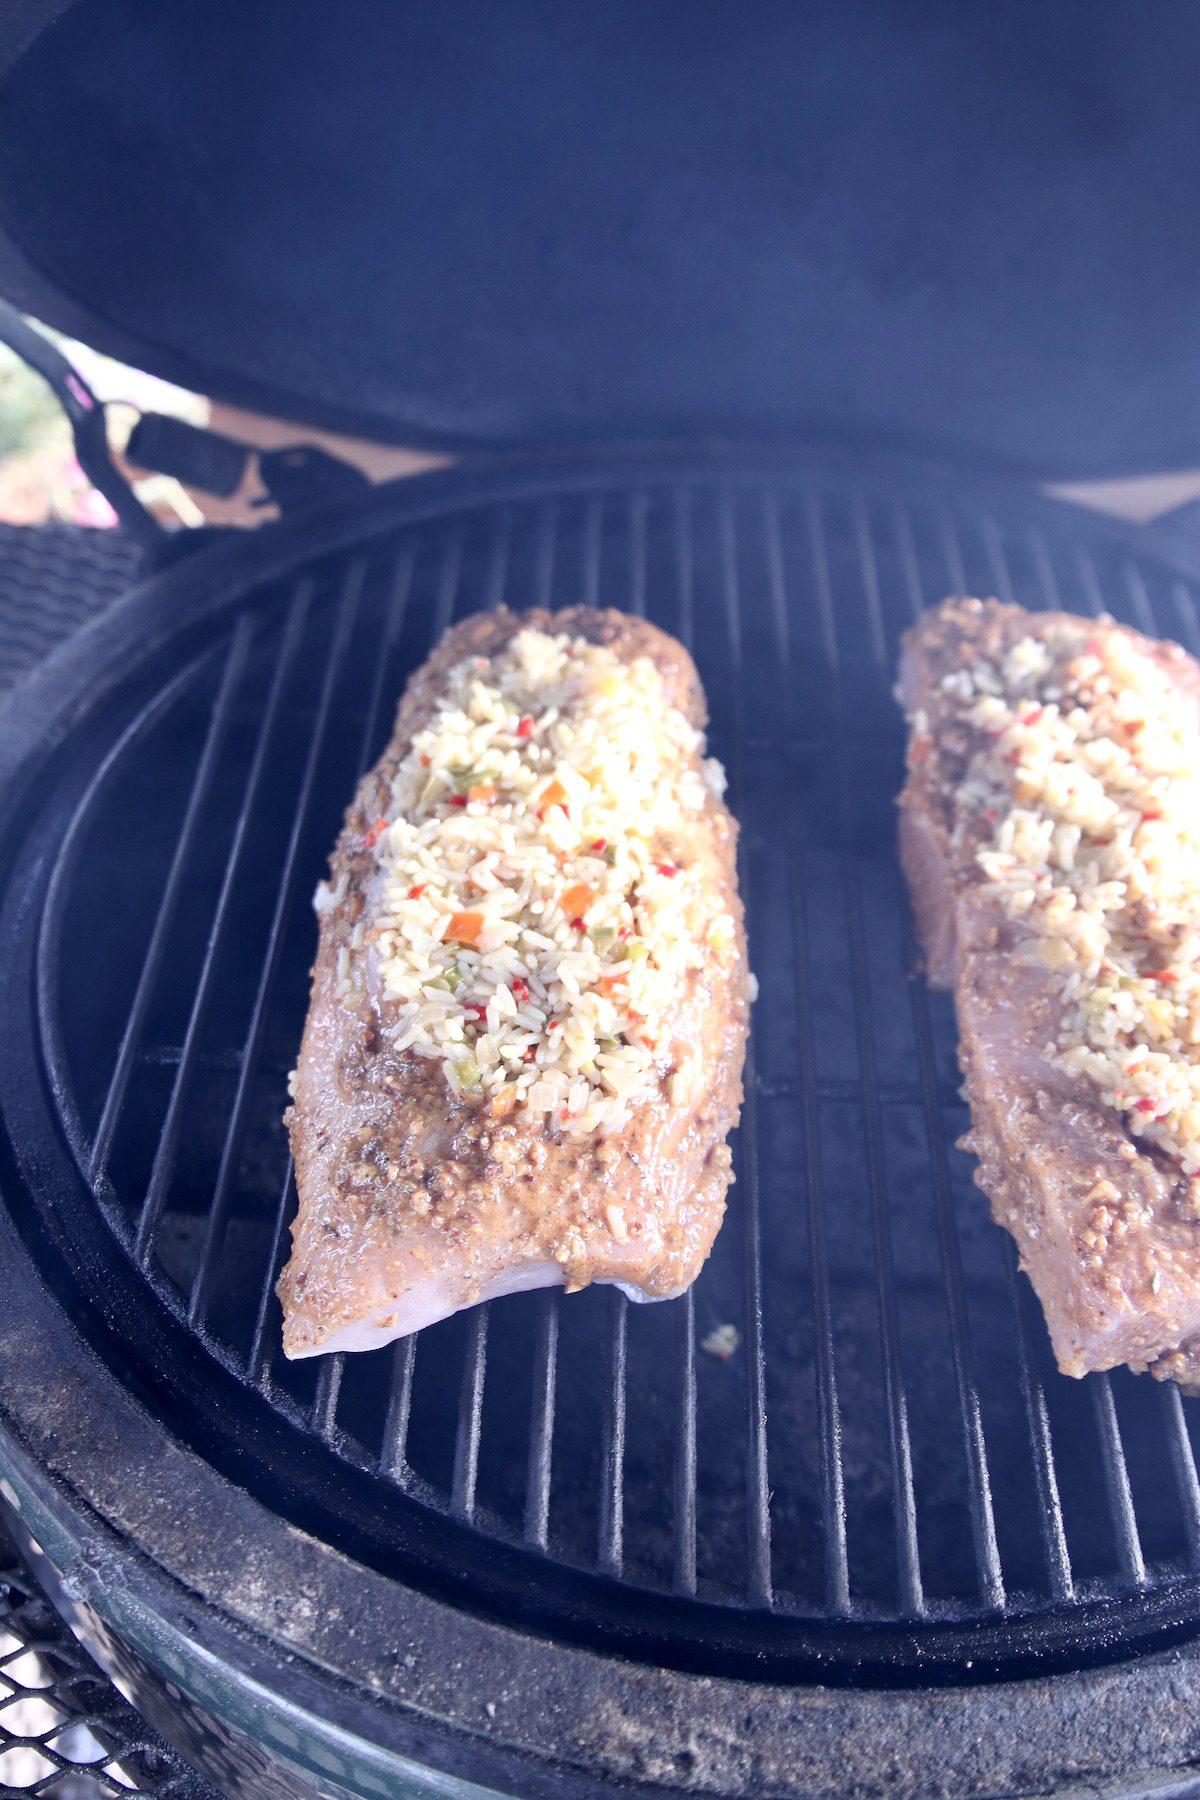 rice pilaf stuffed pork loins on grill